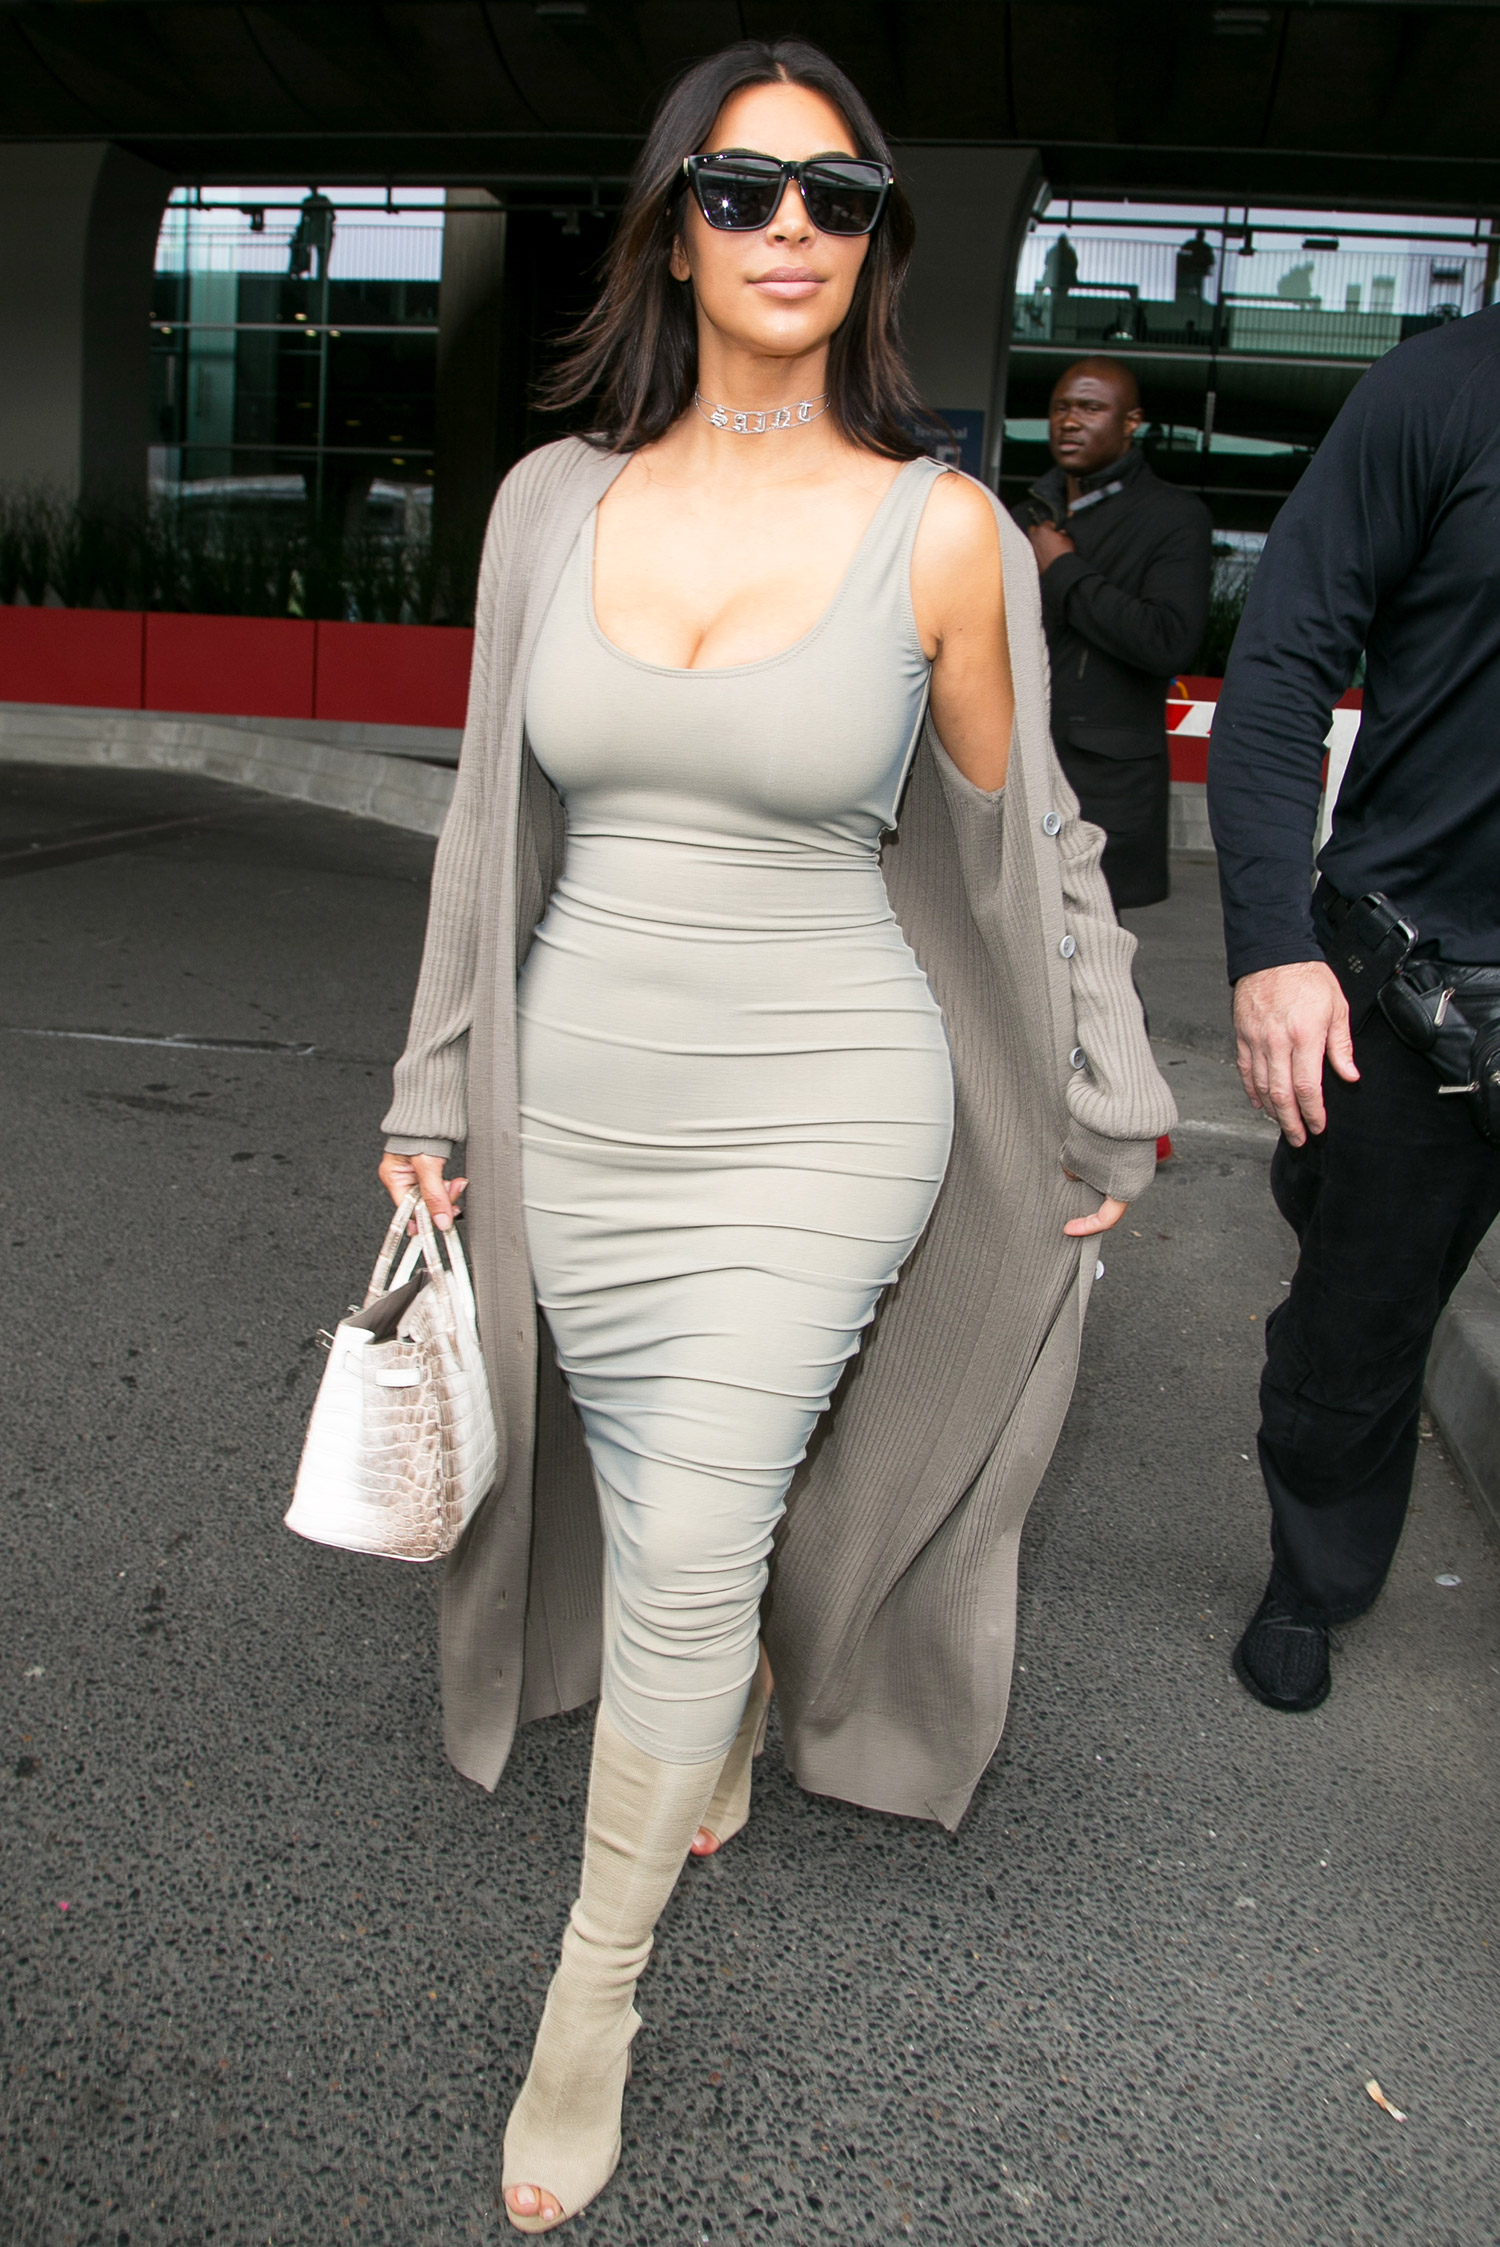 Kim Kardashian's Atkins Diet: How She Lost Pregnancy Weight